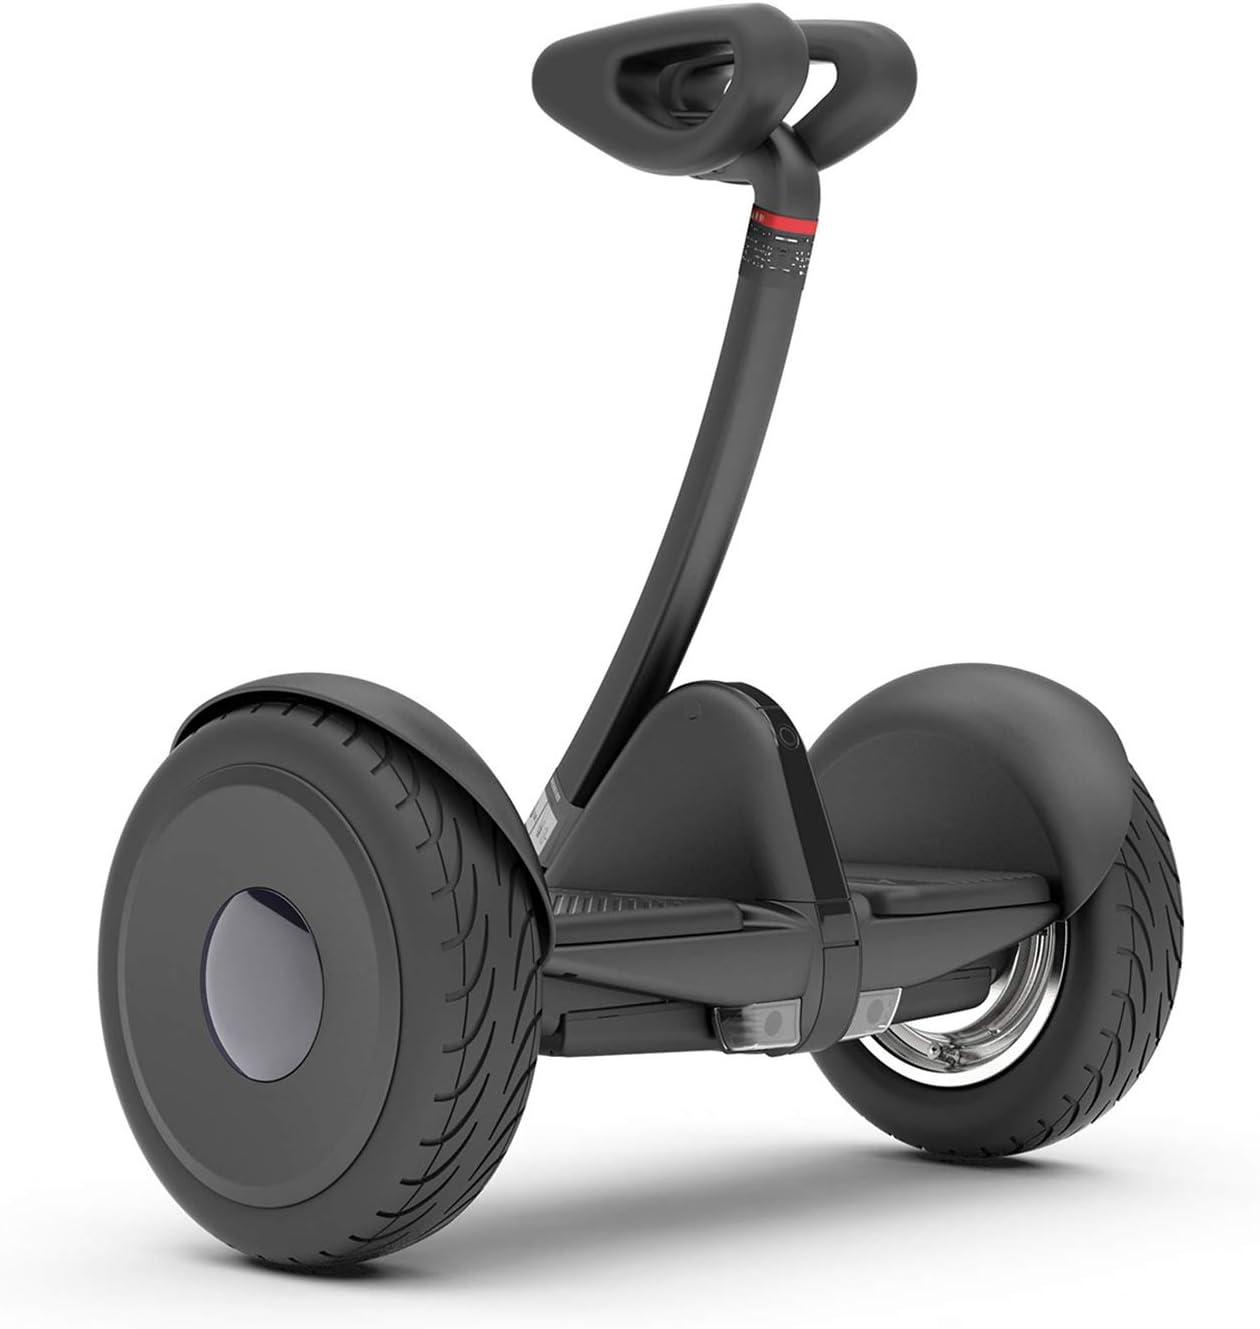 Segway Ninebot S Smart Self-Balancing Electric Scooter